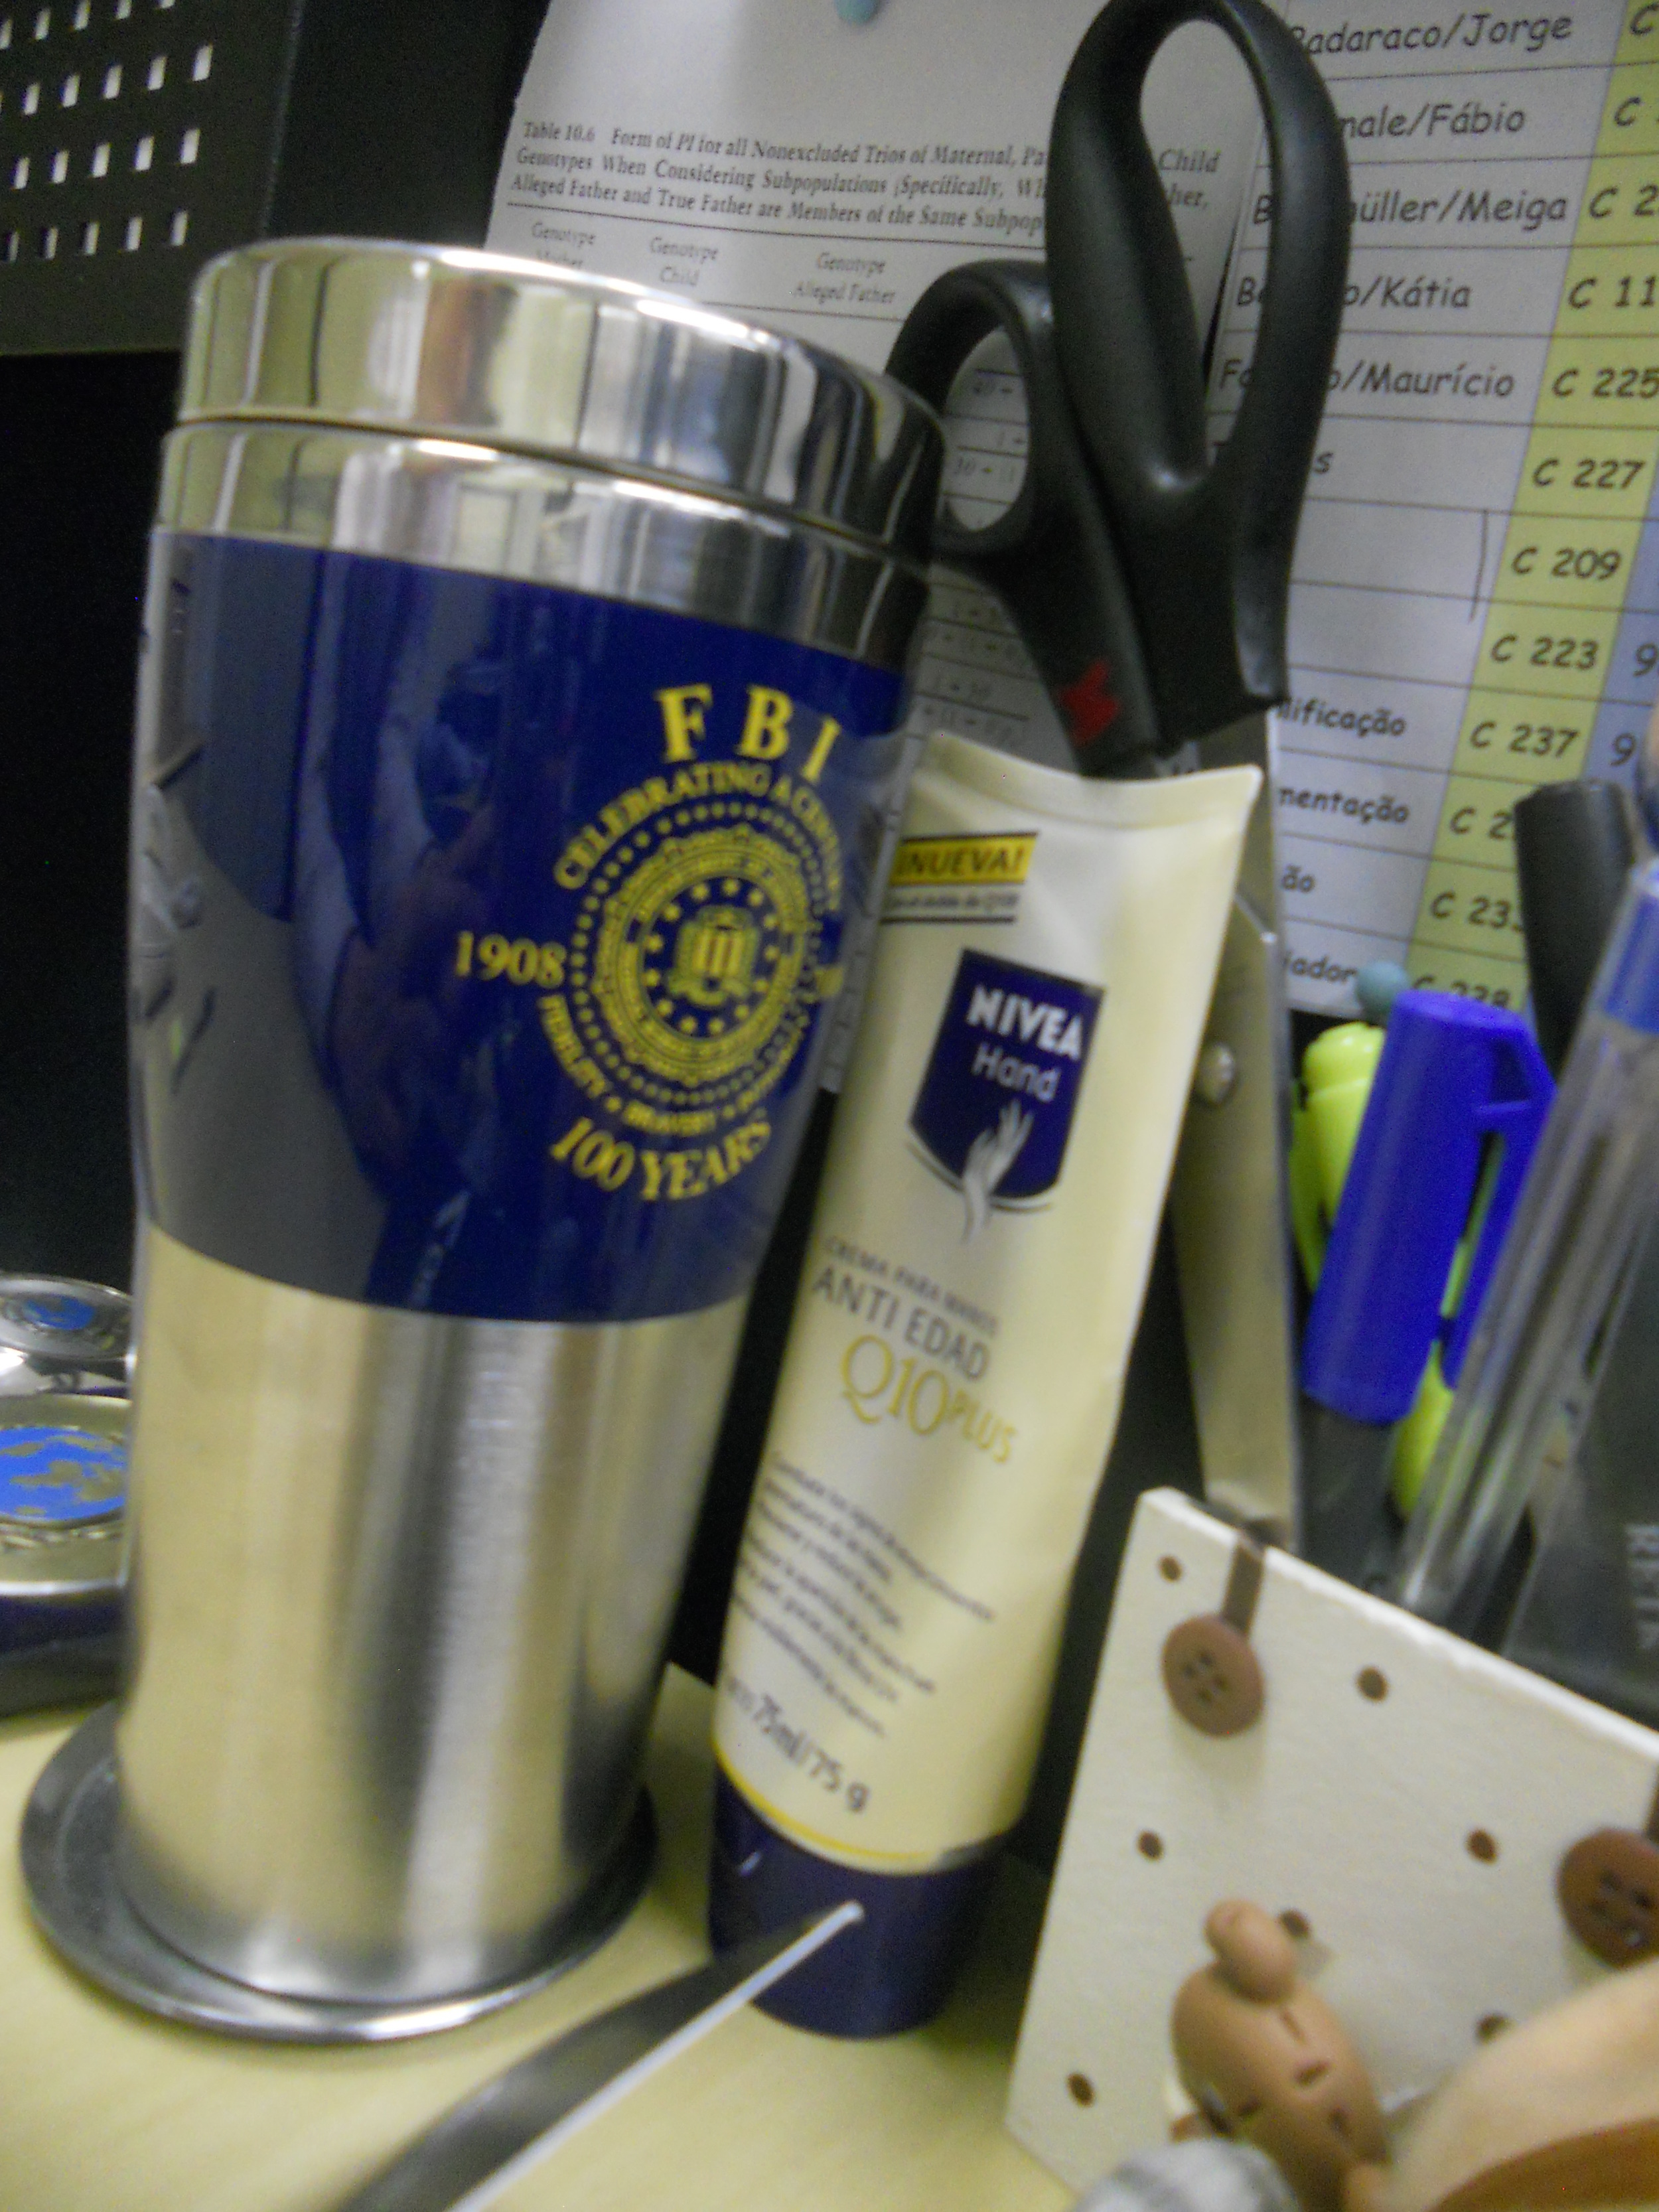 Policia Federal Tools